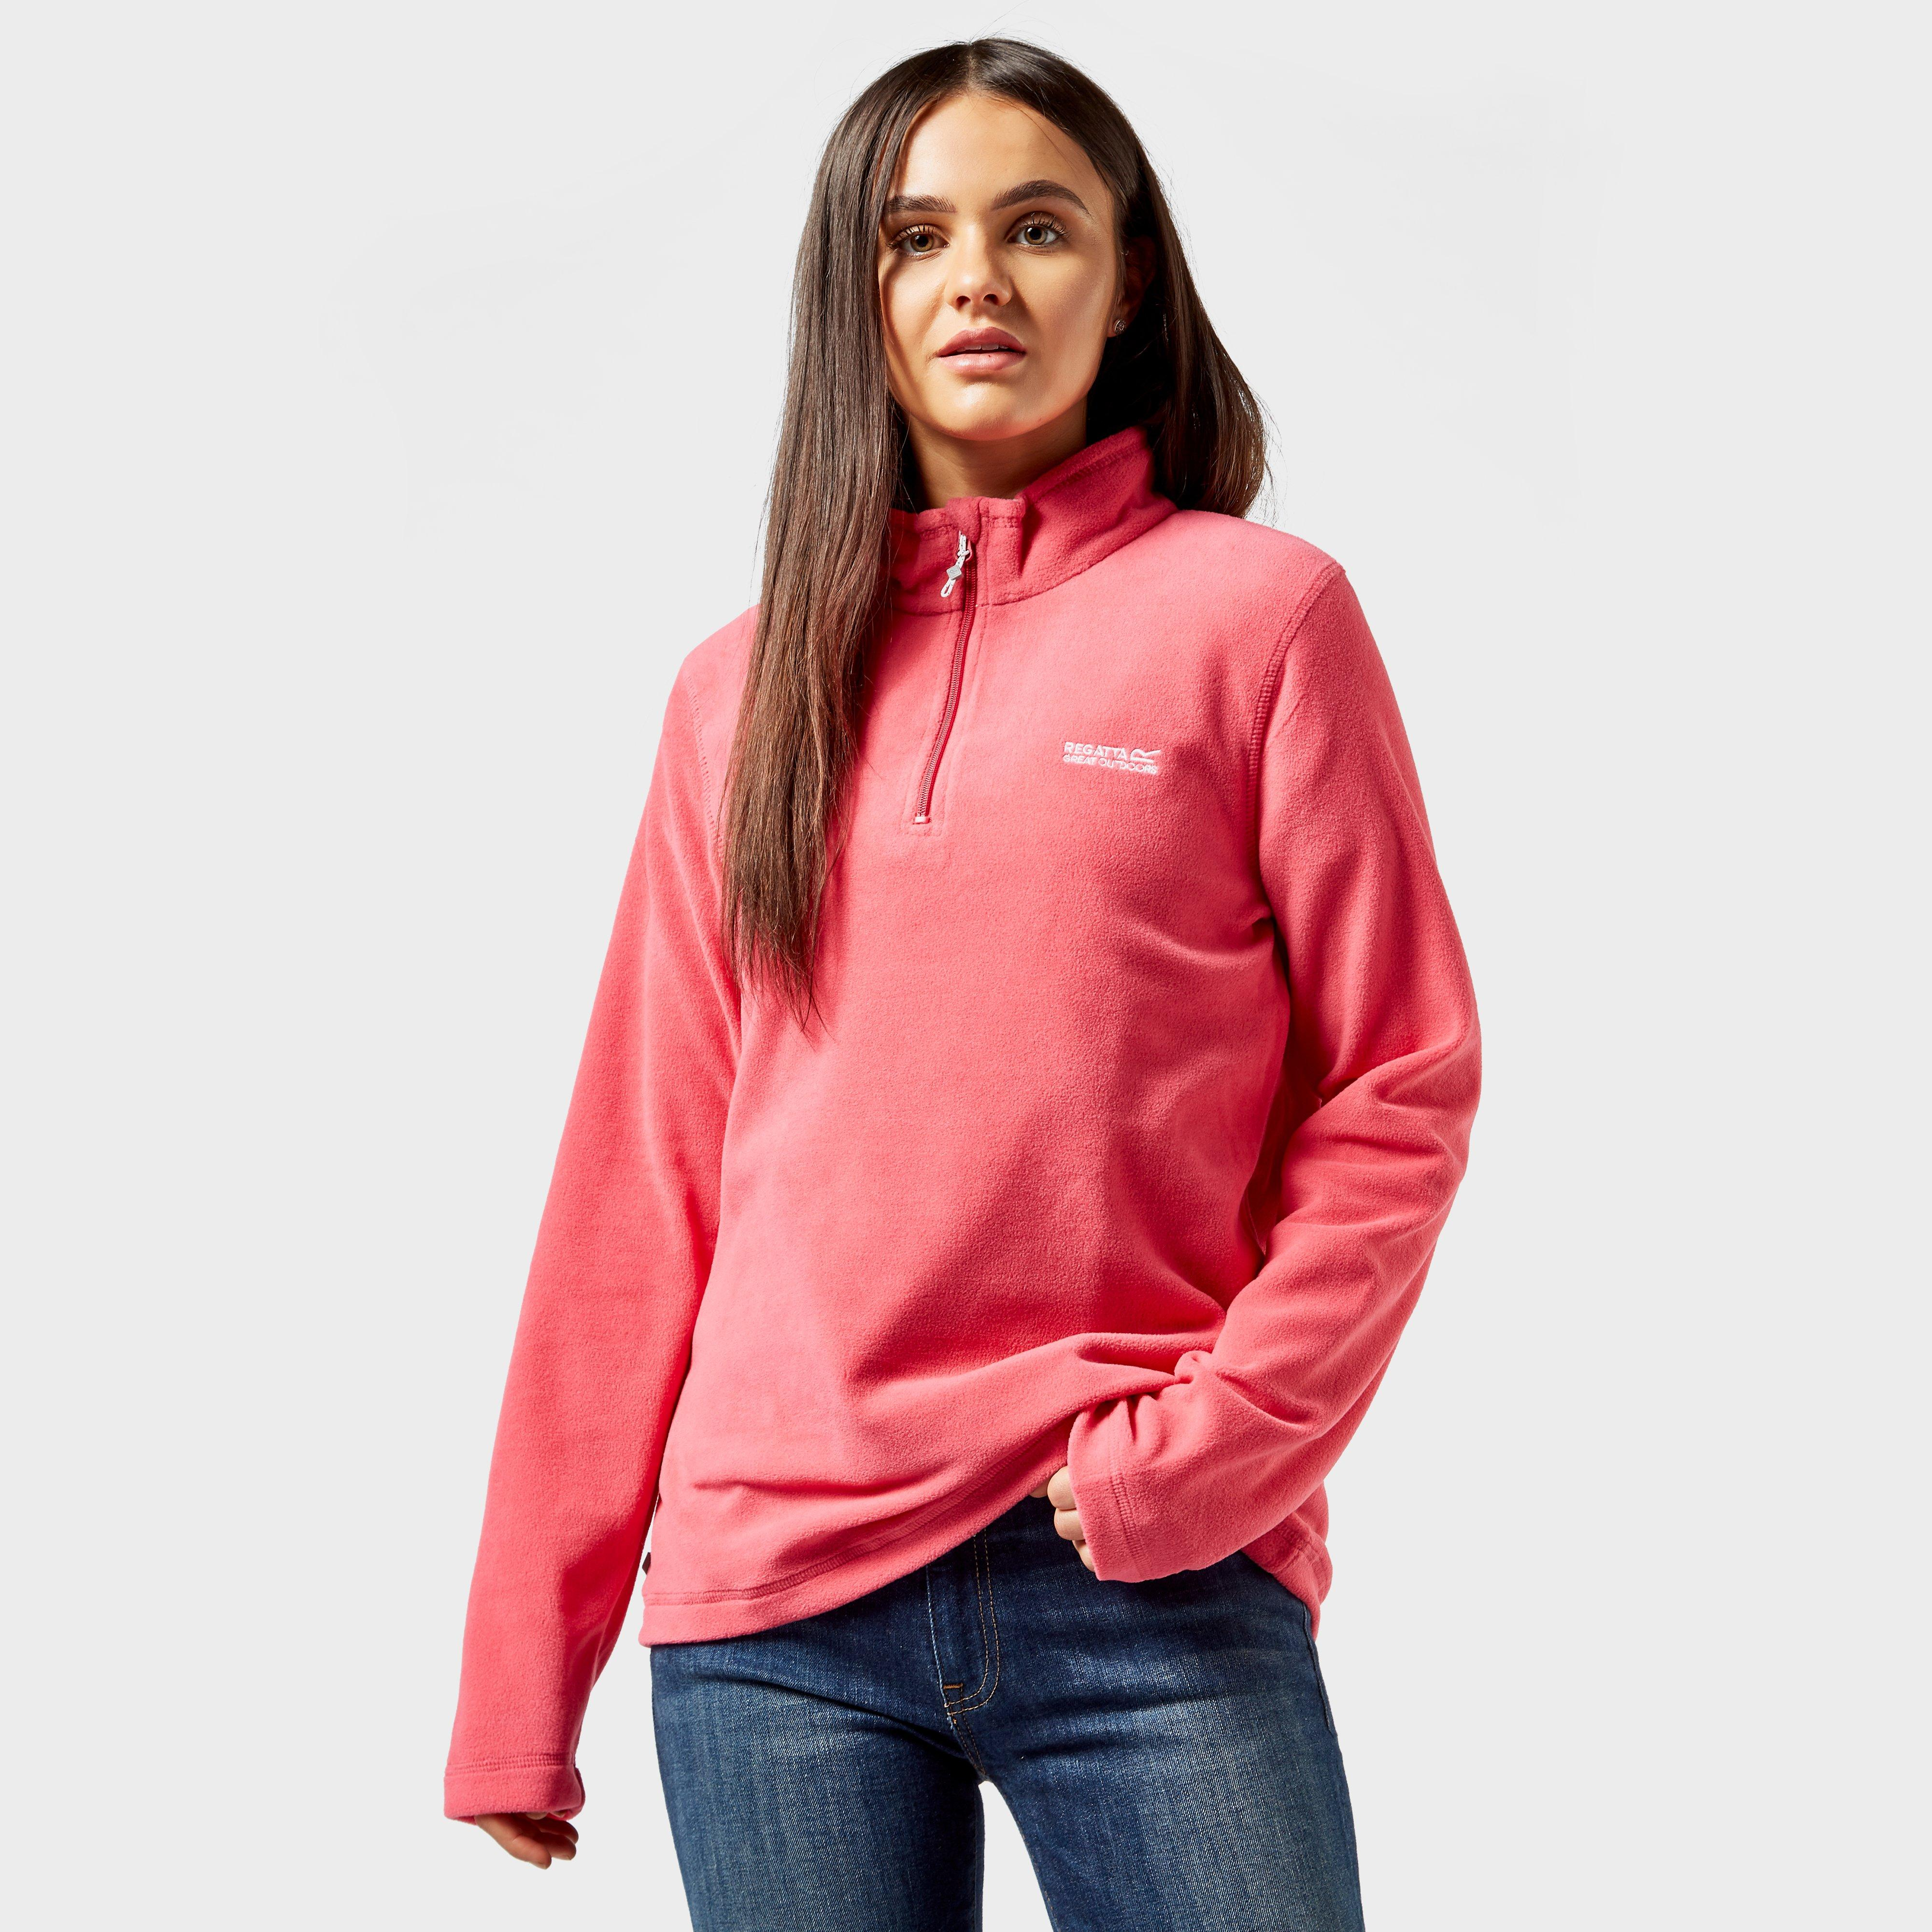 Regatta Womens Sweethart Fleece